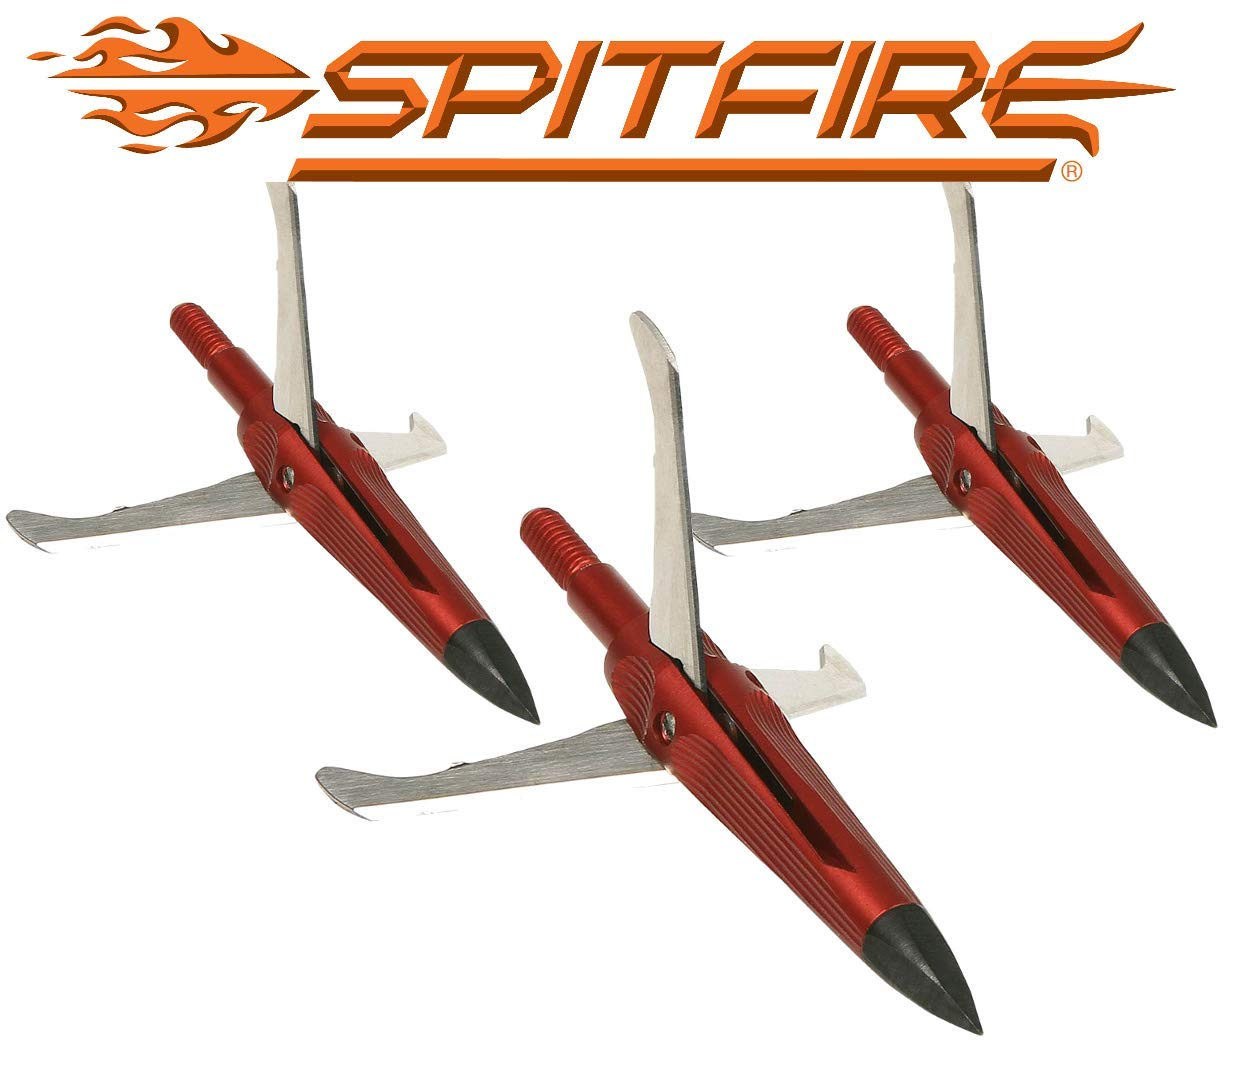 New Archery Products Spitfire MAXX 100GR D6 3PK